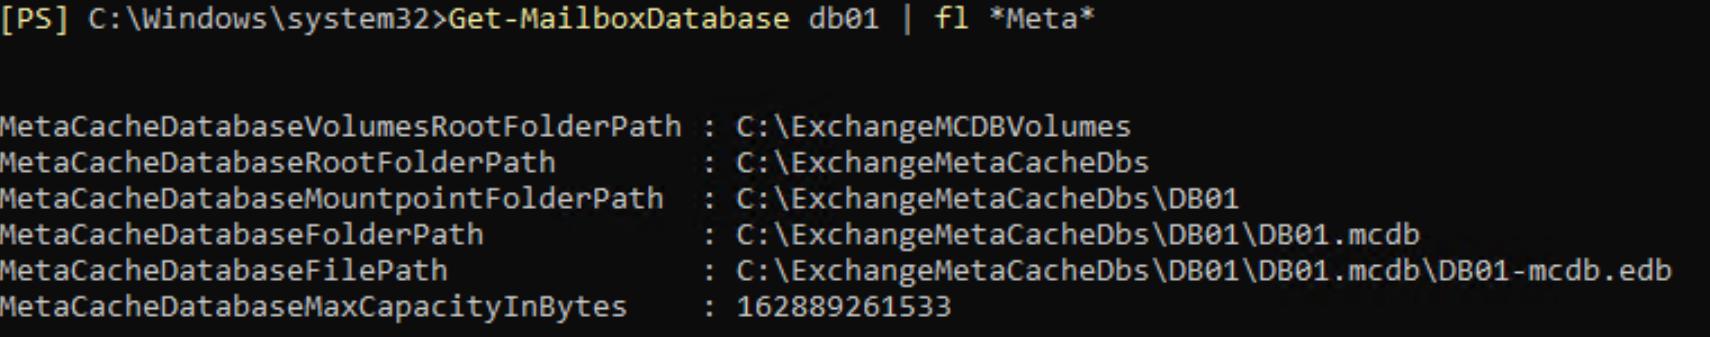 MCDB paths - Get_mailboxDatabase.png